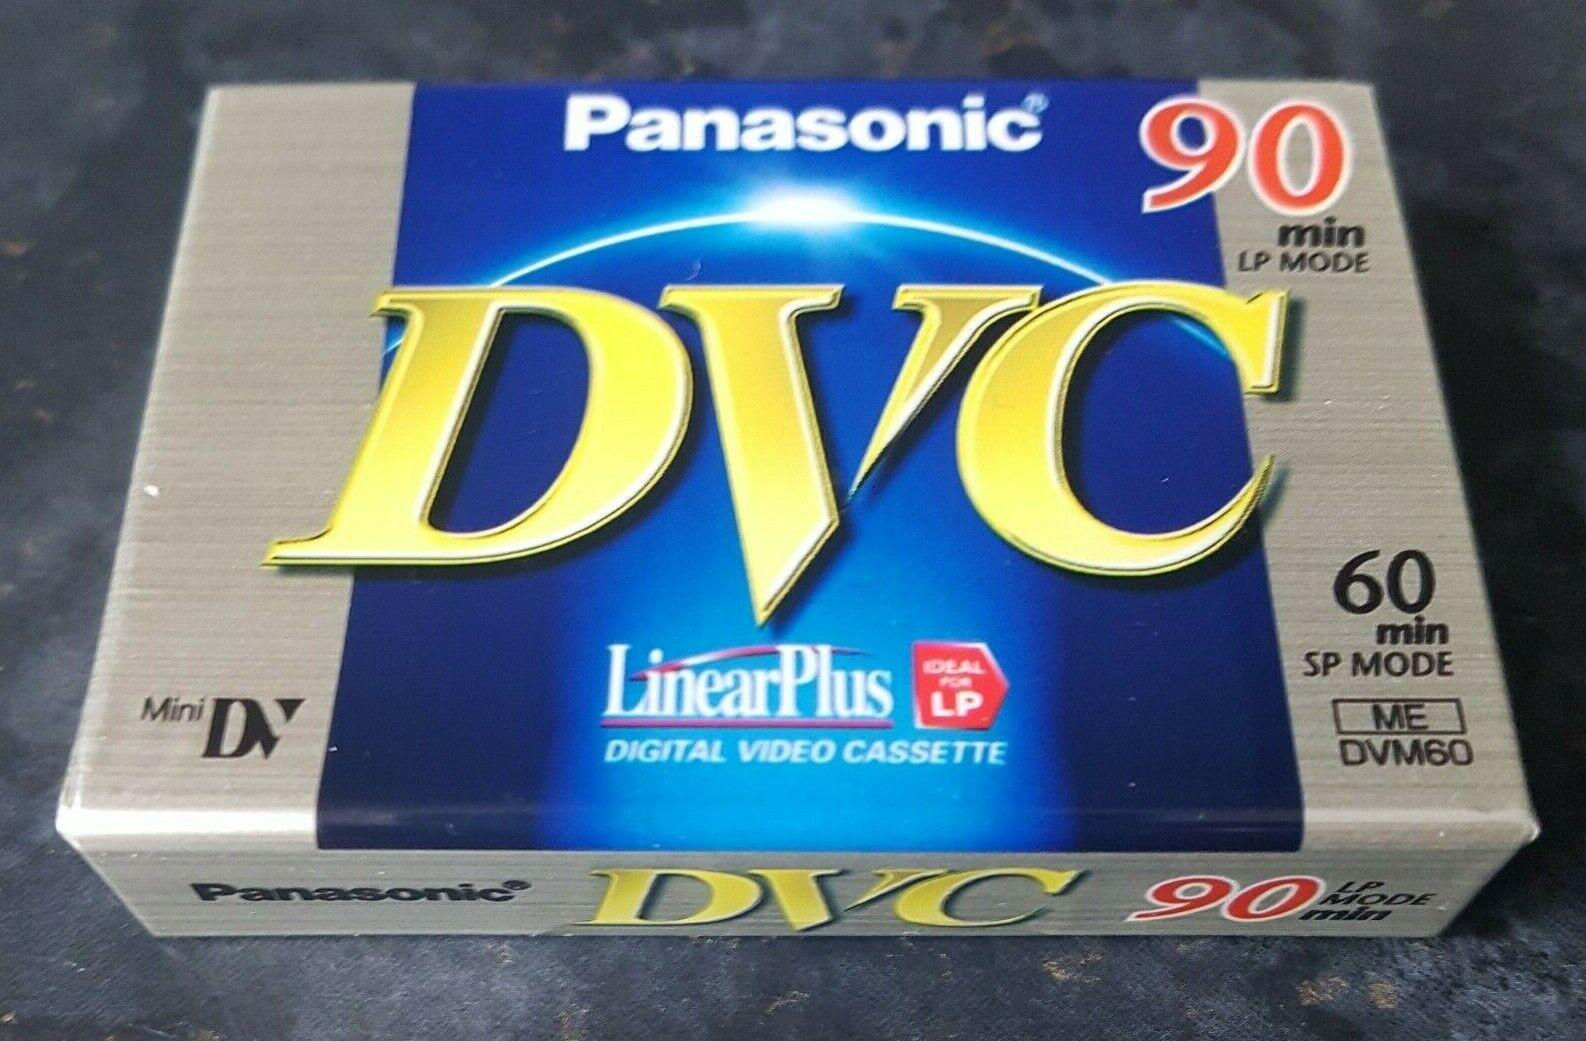 1x Panasonic DVC LP 90min SP 60min AY-DVM60FE Factory Sealed Blank Tape